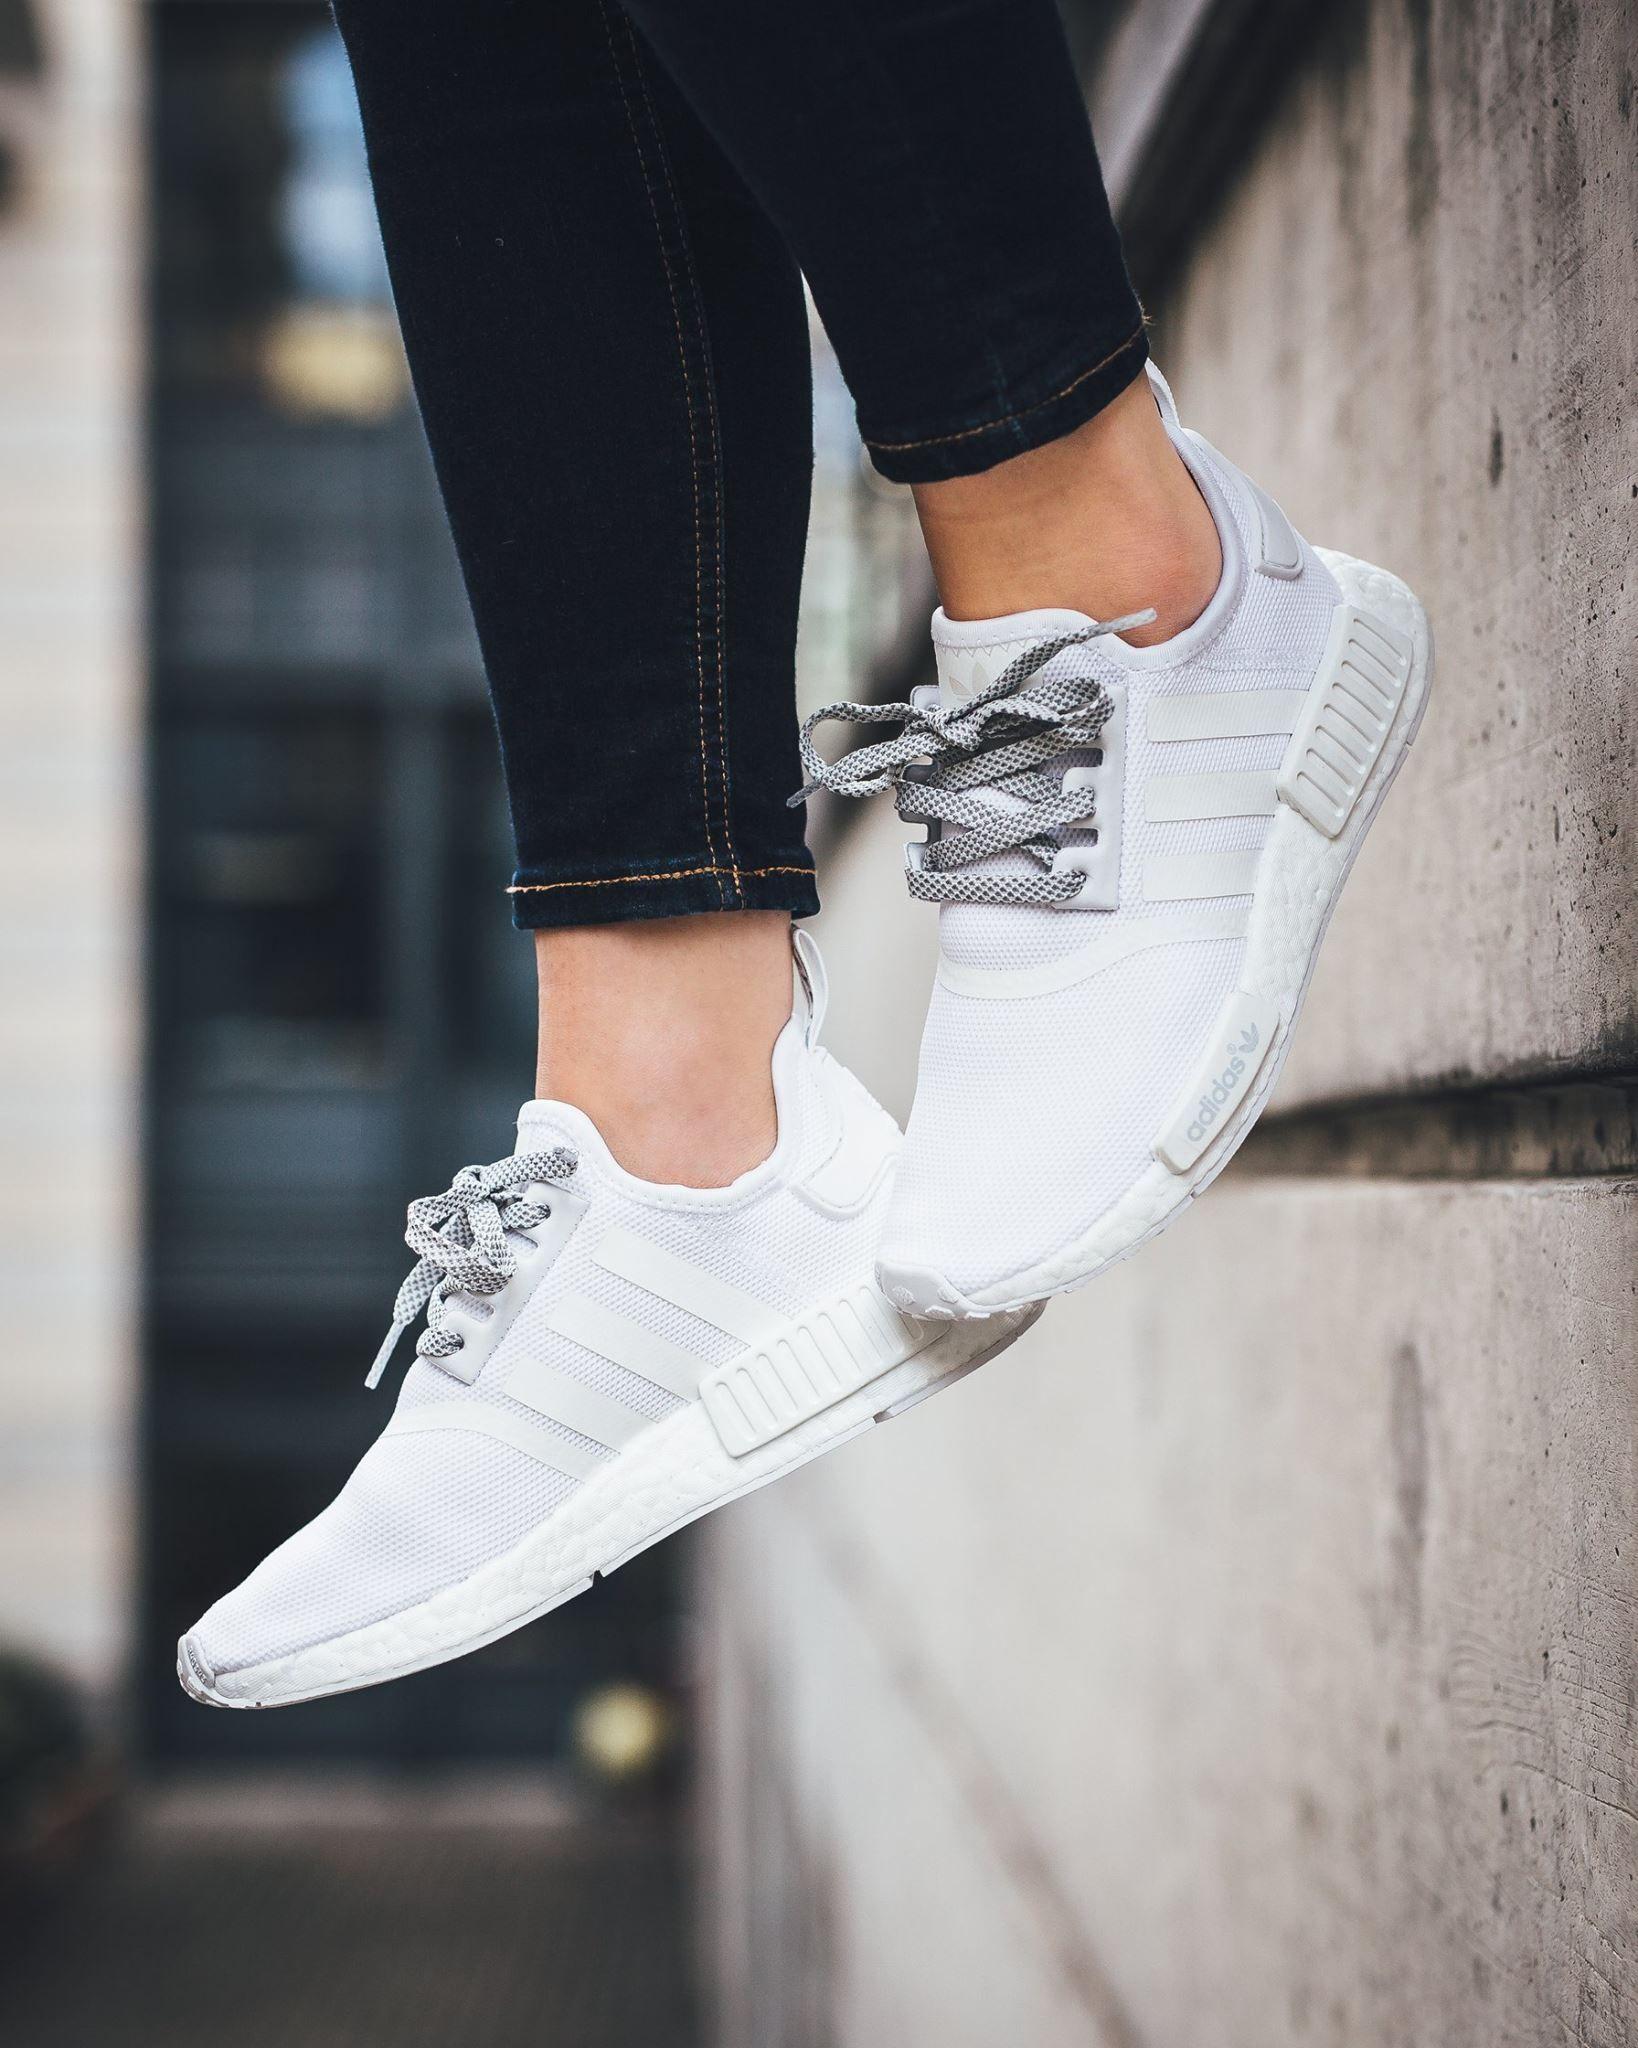 Fashion Shoes Adidas on | Adidas shoes women, Adidas women